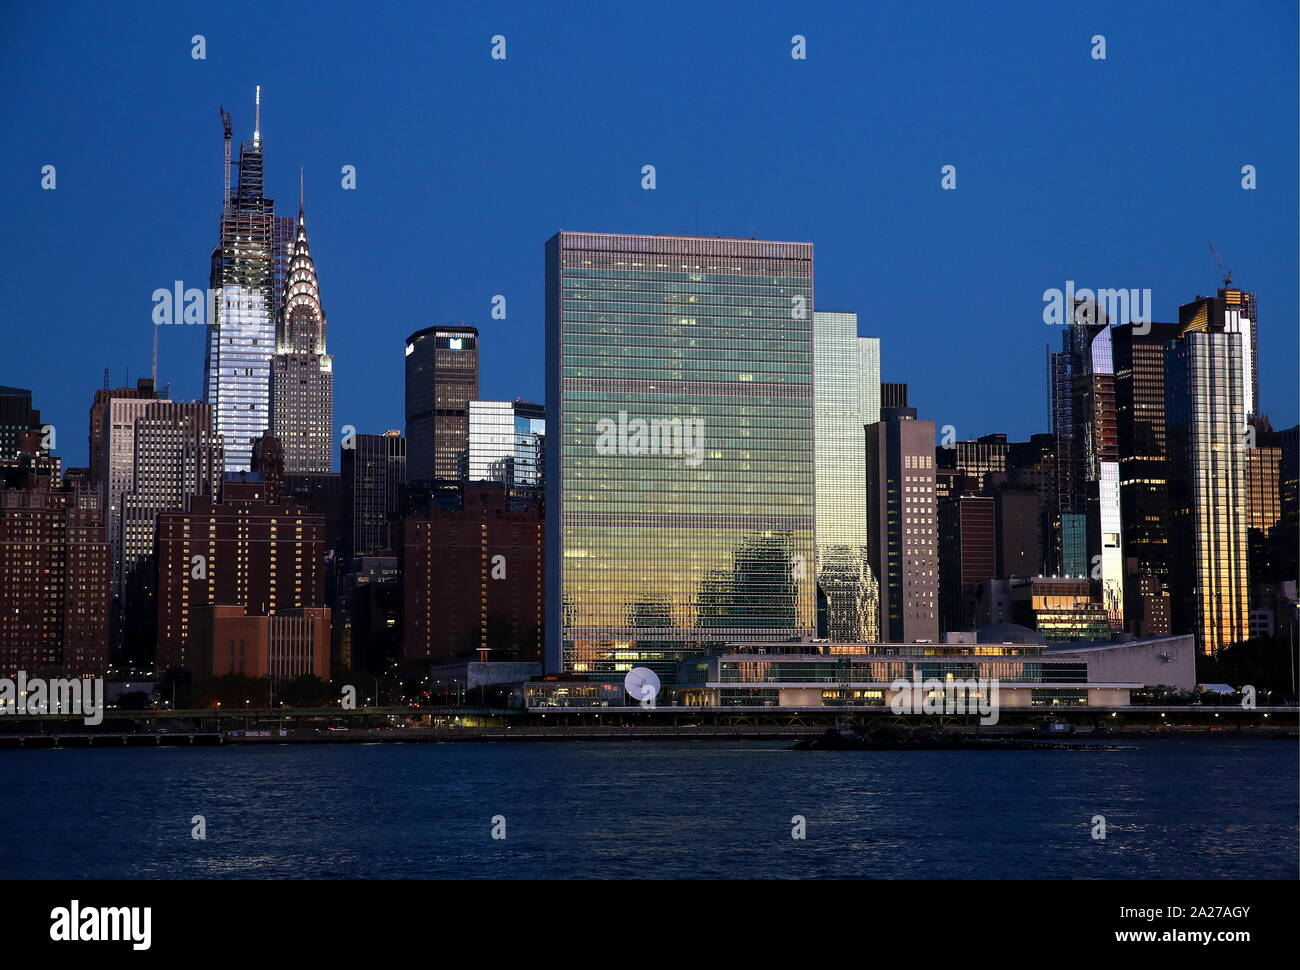 New York City, USA. 29th Sep, 2019. NEW YORK CITY, USA - SEPTEMBER 28, 2019: A view of the United Nations (UN) headquarters. Valery Sharifulin/TASS Credit: ITAR-TASS News Agency/Alamy Live News Stock Photo